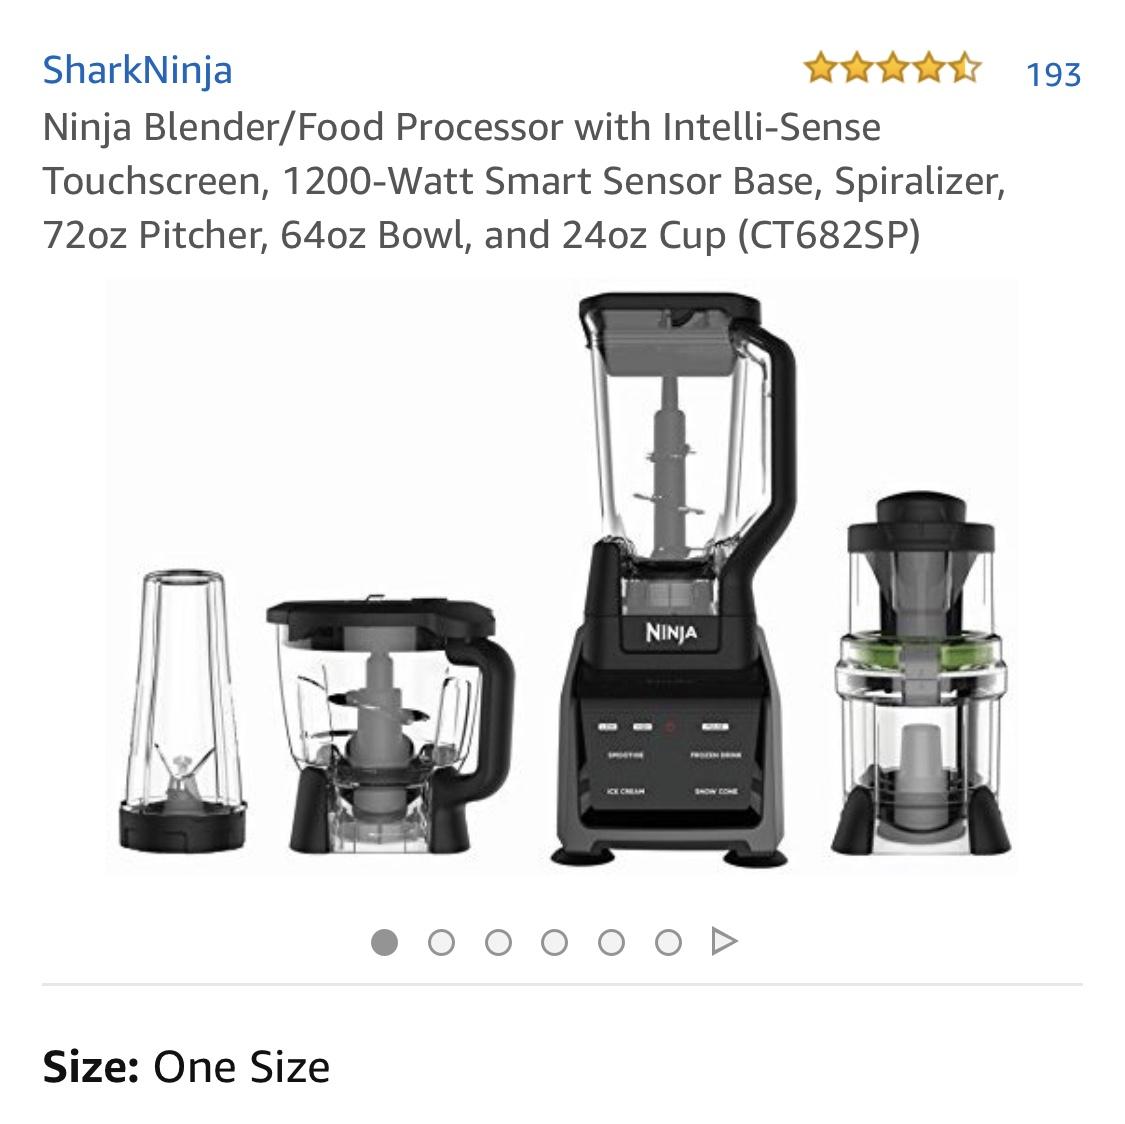 Ninja Blender / Food Processor